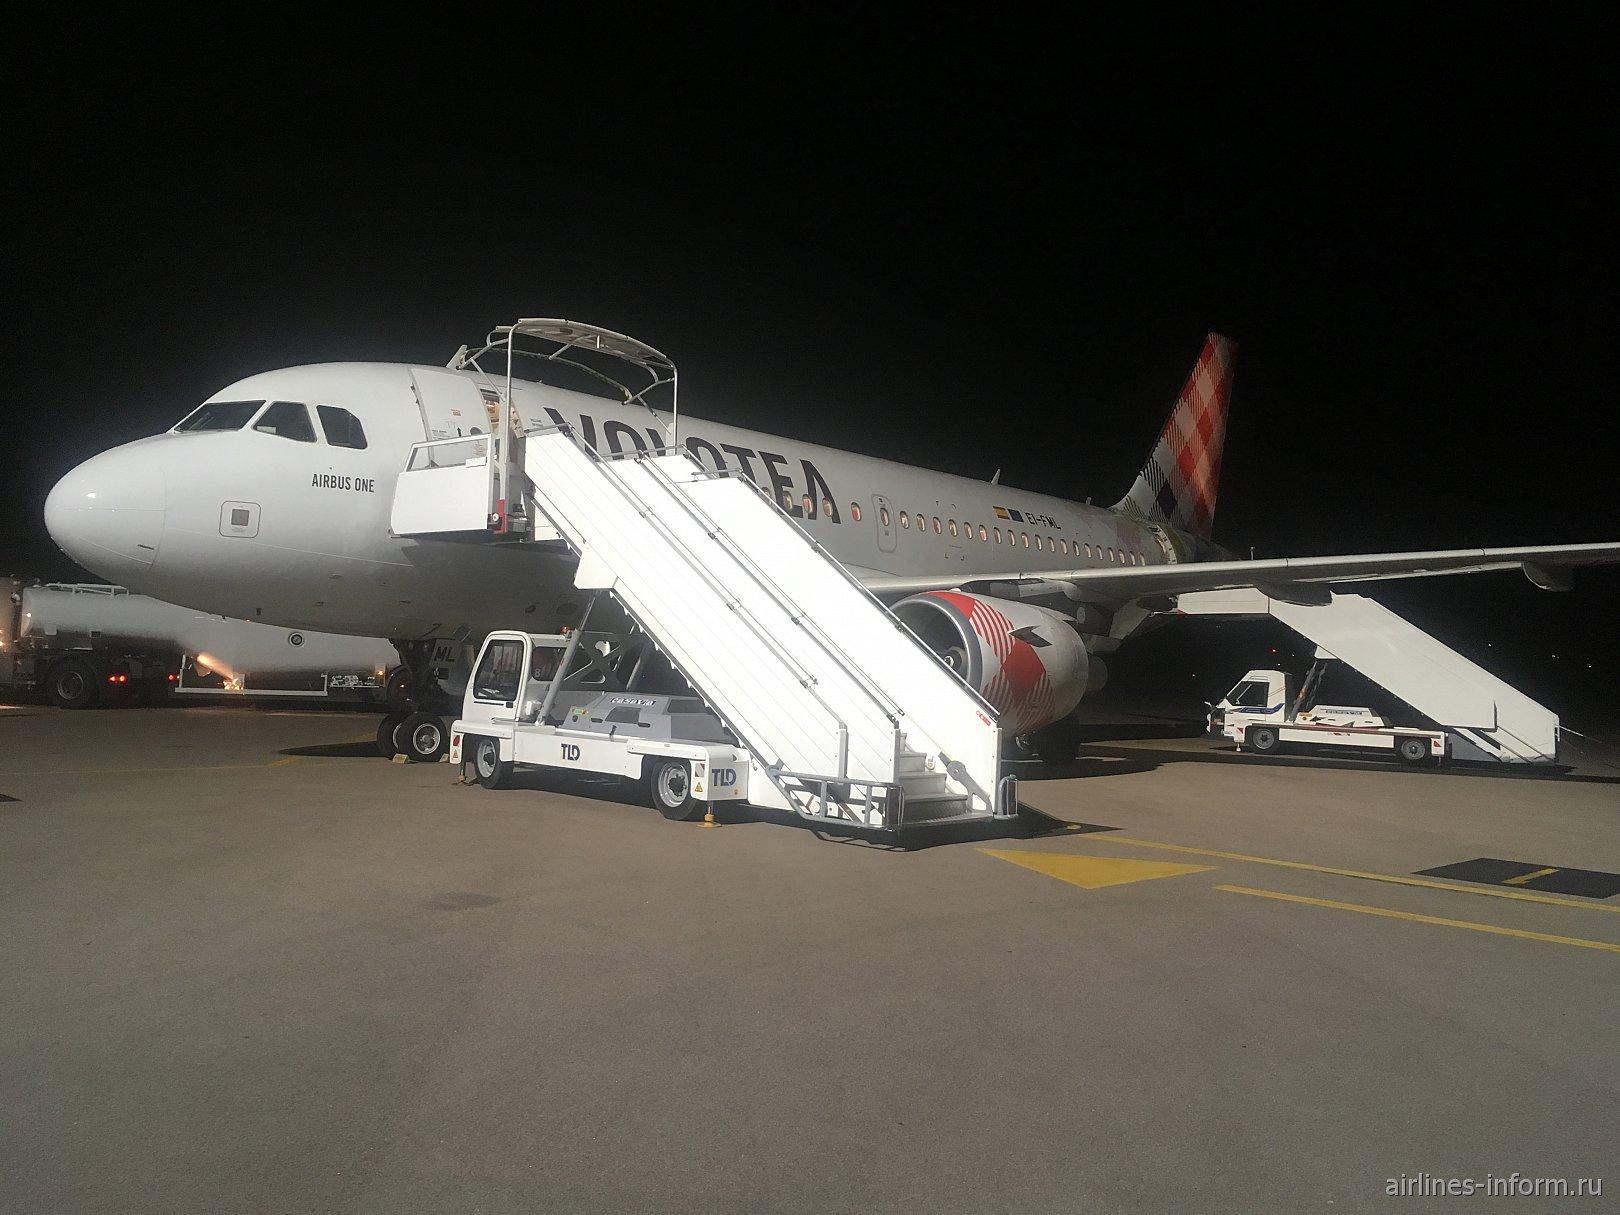 Французские заметки (малоизведання Европа продолжение): часть 4  Аяччо  (AJA) - Тулуза-Бланьяк(TLS) с Volotea на A319 (EI-FML)